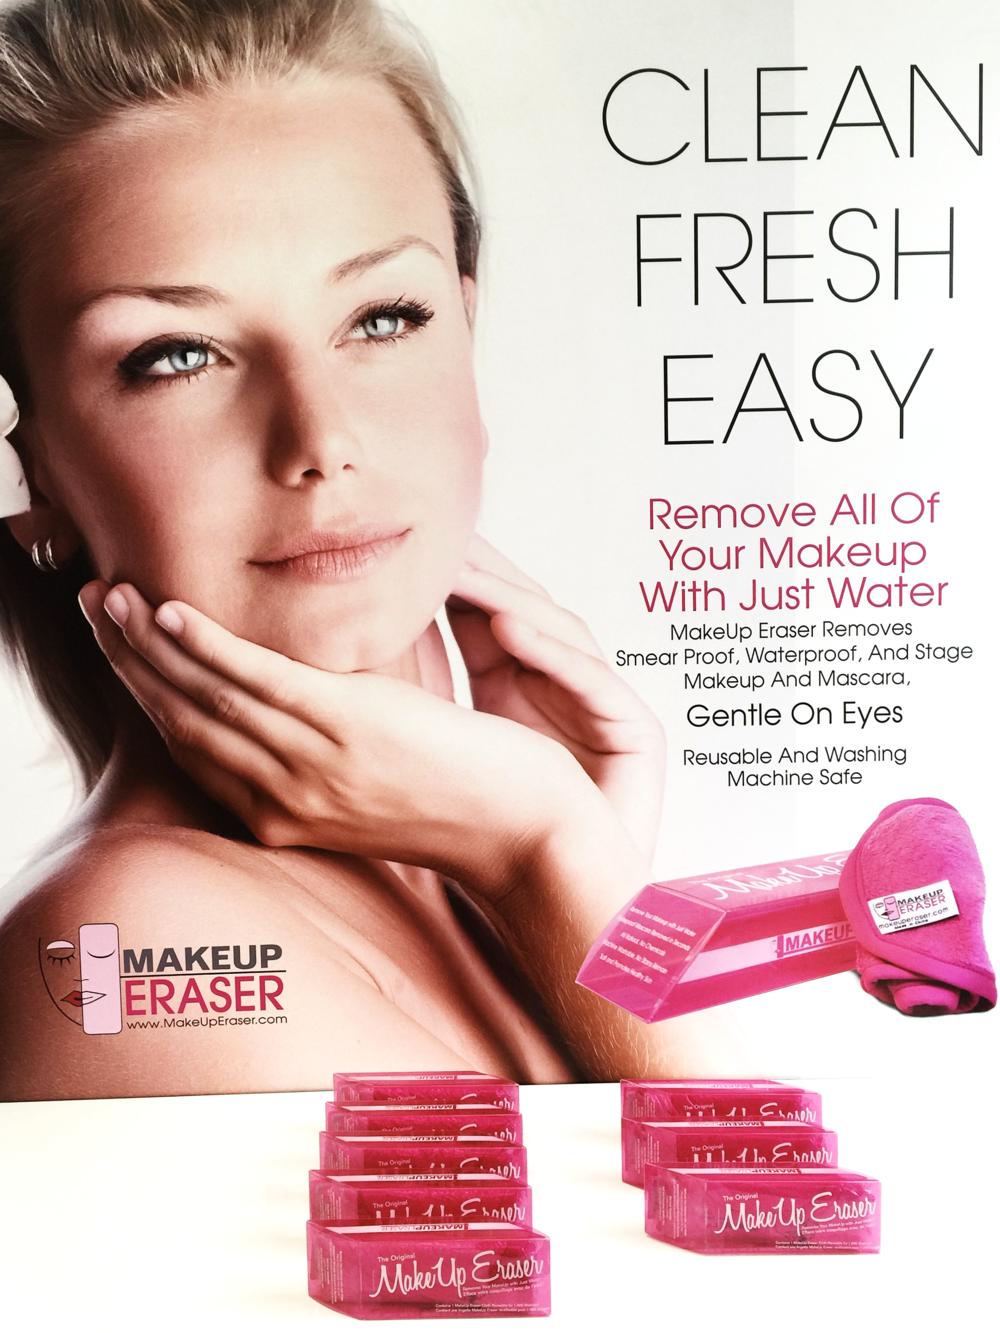 Marisa Robinson Makeup Artist Sephora Showcase Makeup Eraser